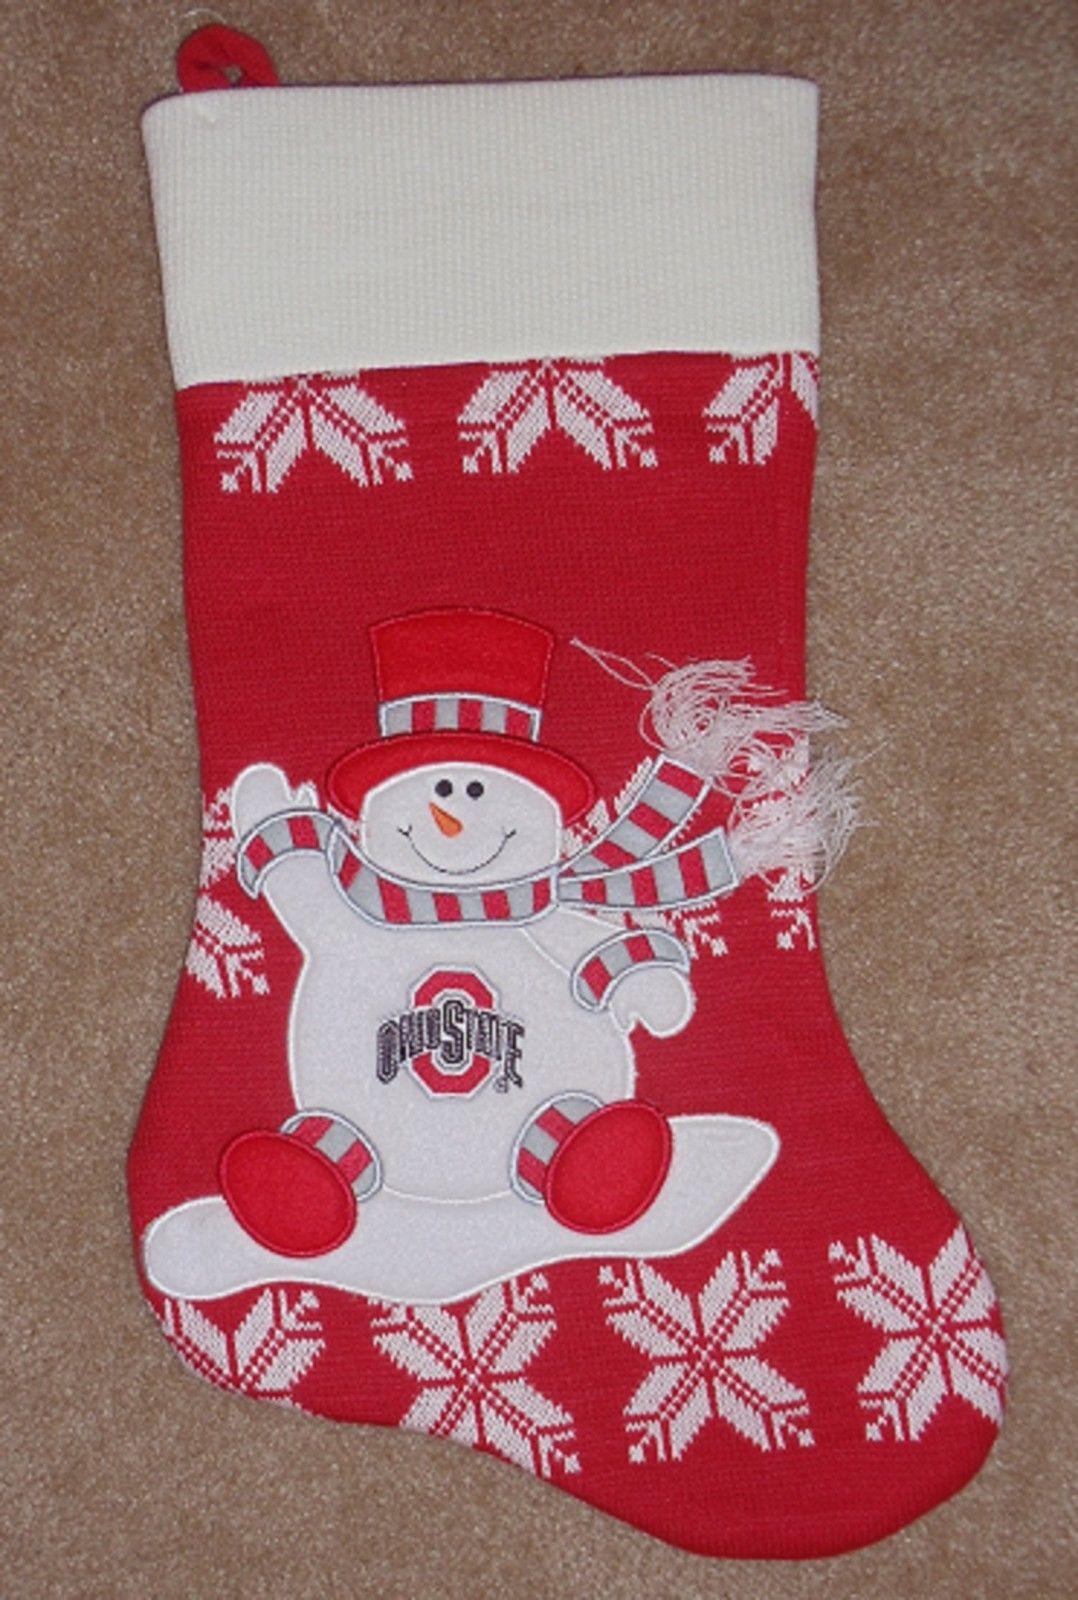 OSU Christmas stocking-new-handmade